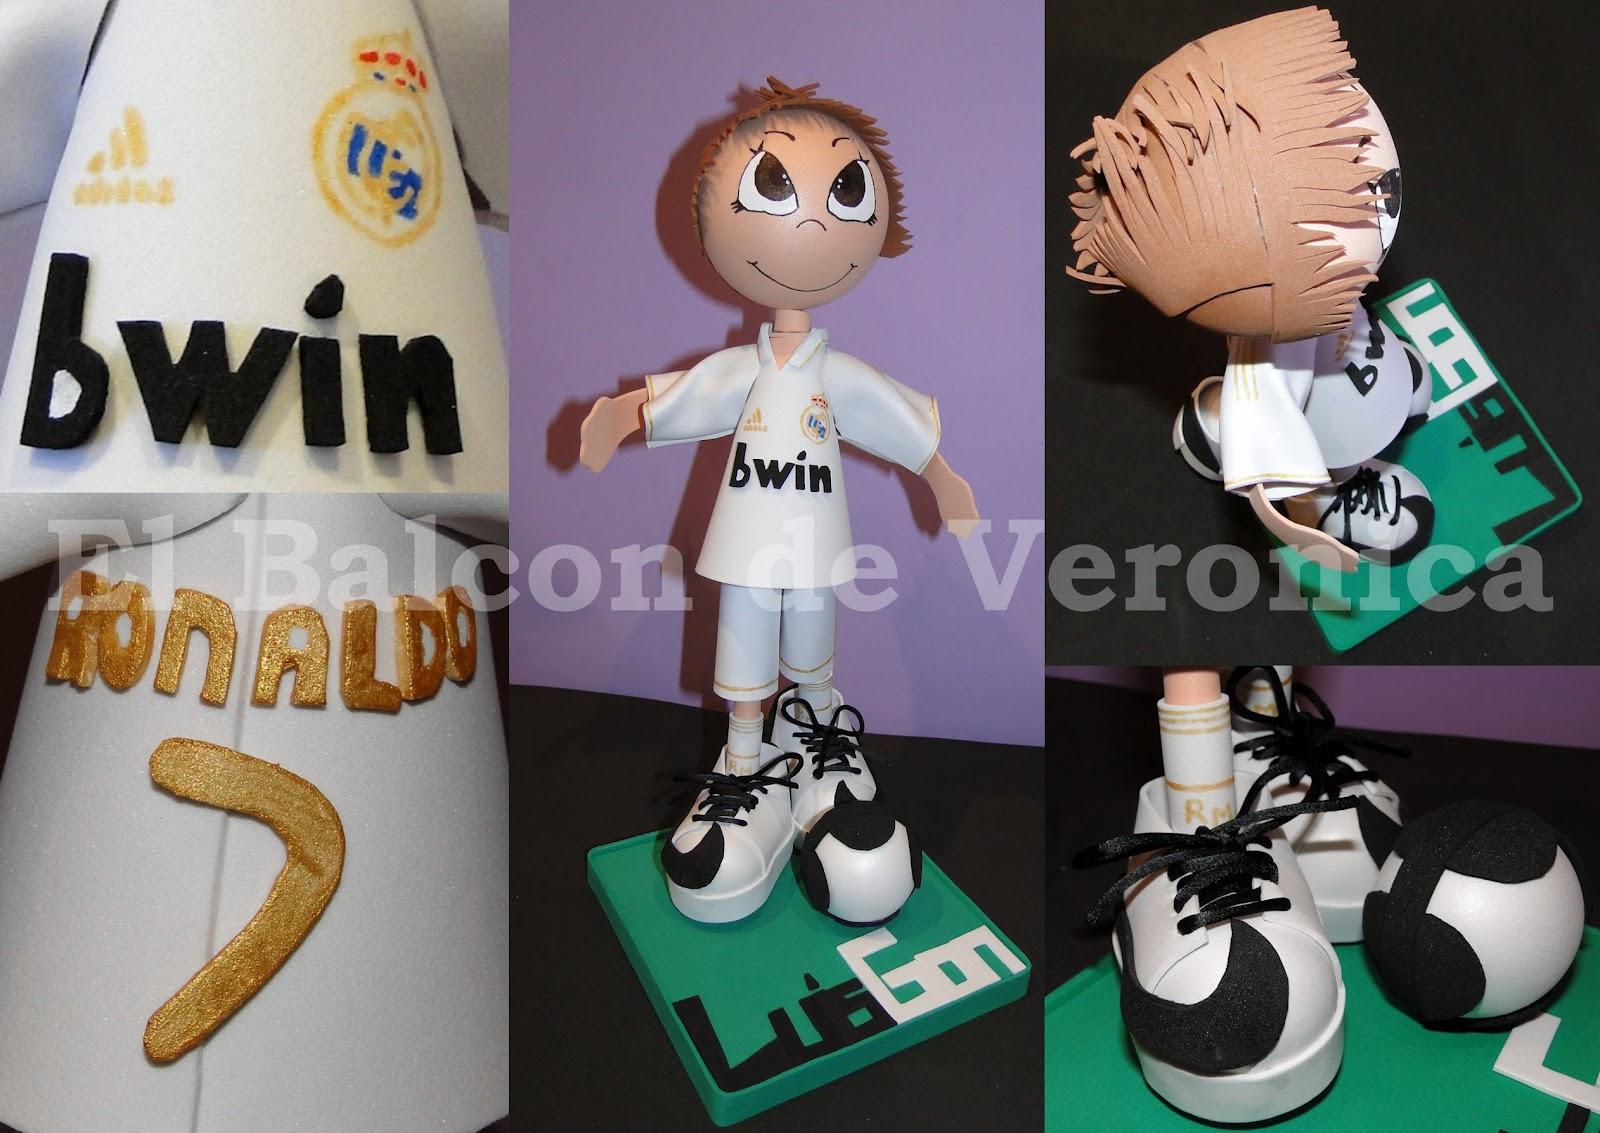 http://3.bp.blogspot.com/-kA0AgleE4bQ/UFb72Gi7rOI/AAAAAAAAAC4/HNxsxVwUpCM/s1600/Cristiano+Ronaldo.jpg